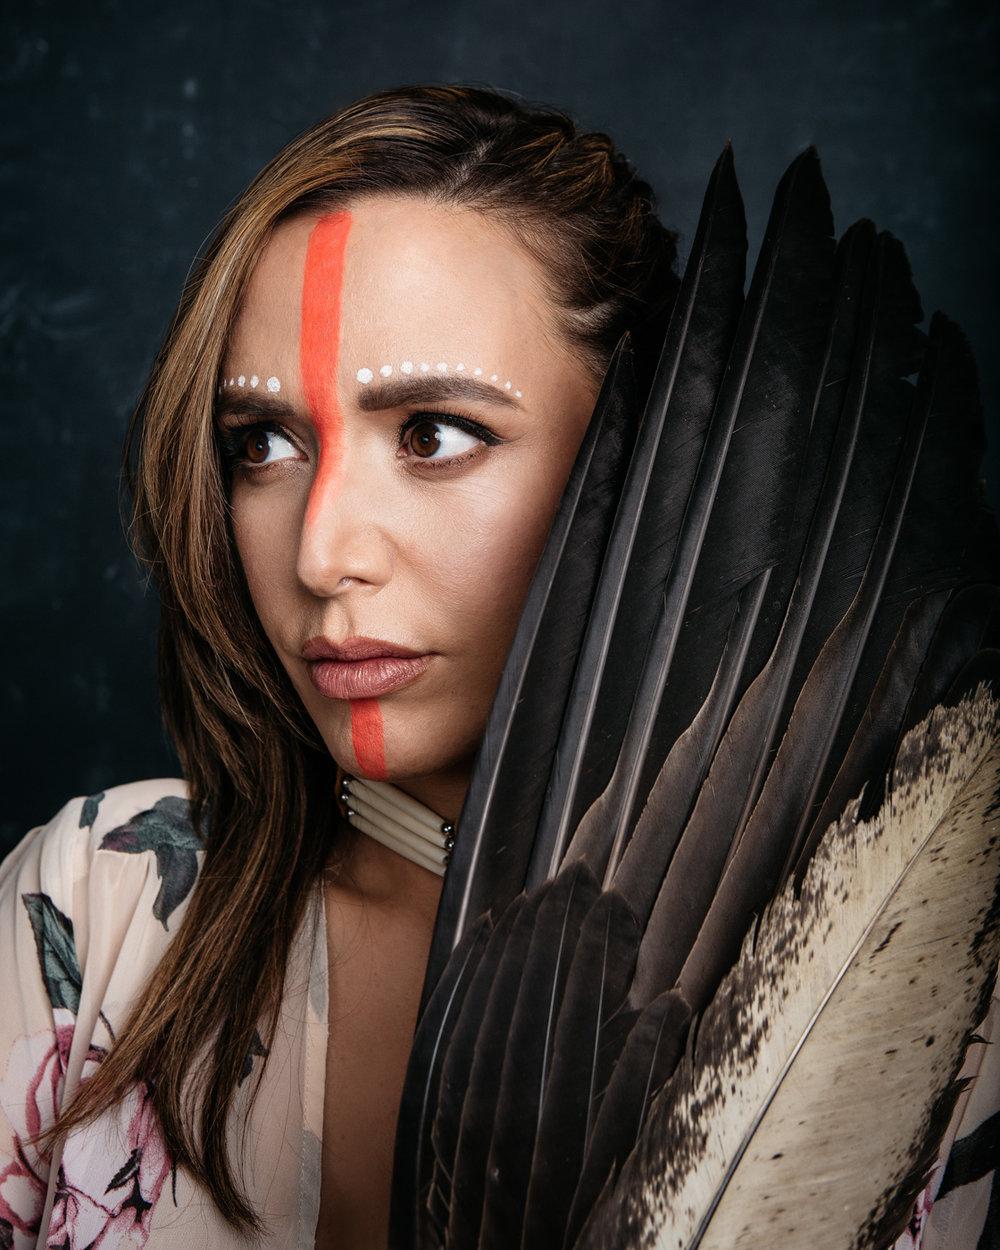 AprilEveWiberg-Edmonton-WomenOfVision-Studio-Portrait-Photography-web-2.jpg